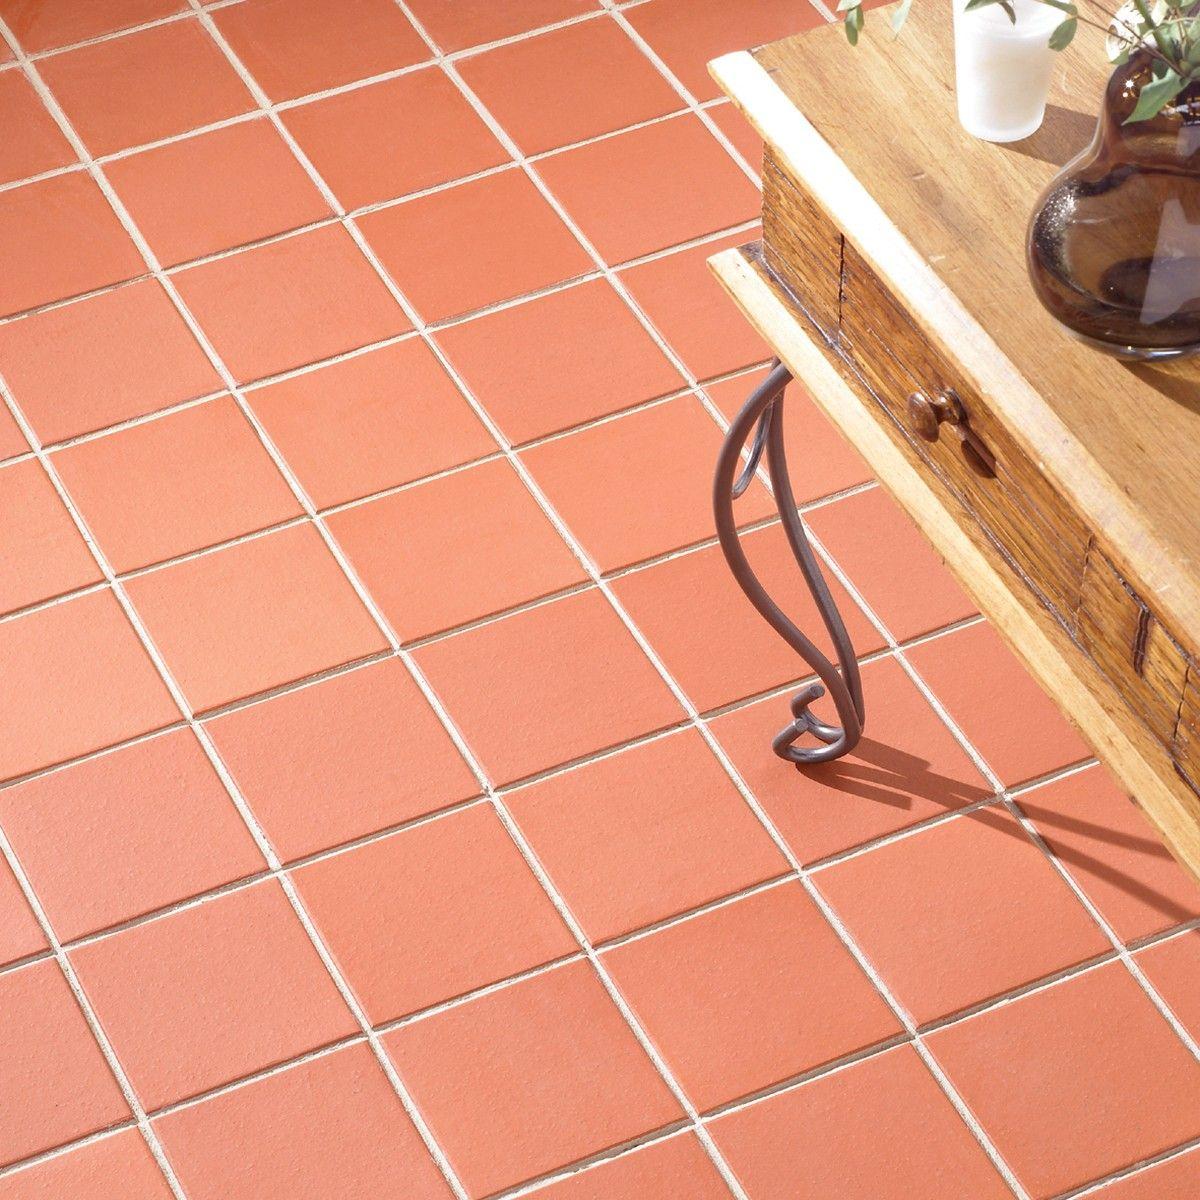 Crown tiles sima red quarry floor tiles crown tiles quarry crown tiles sima red quarry floor tiles crown tiles dailygadgetfo Choice Image